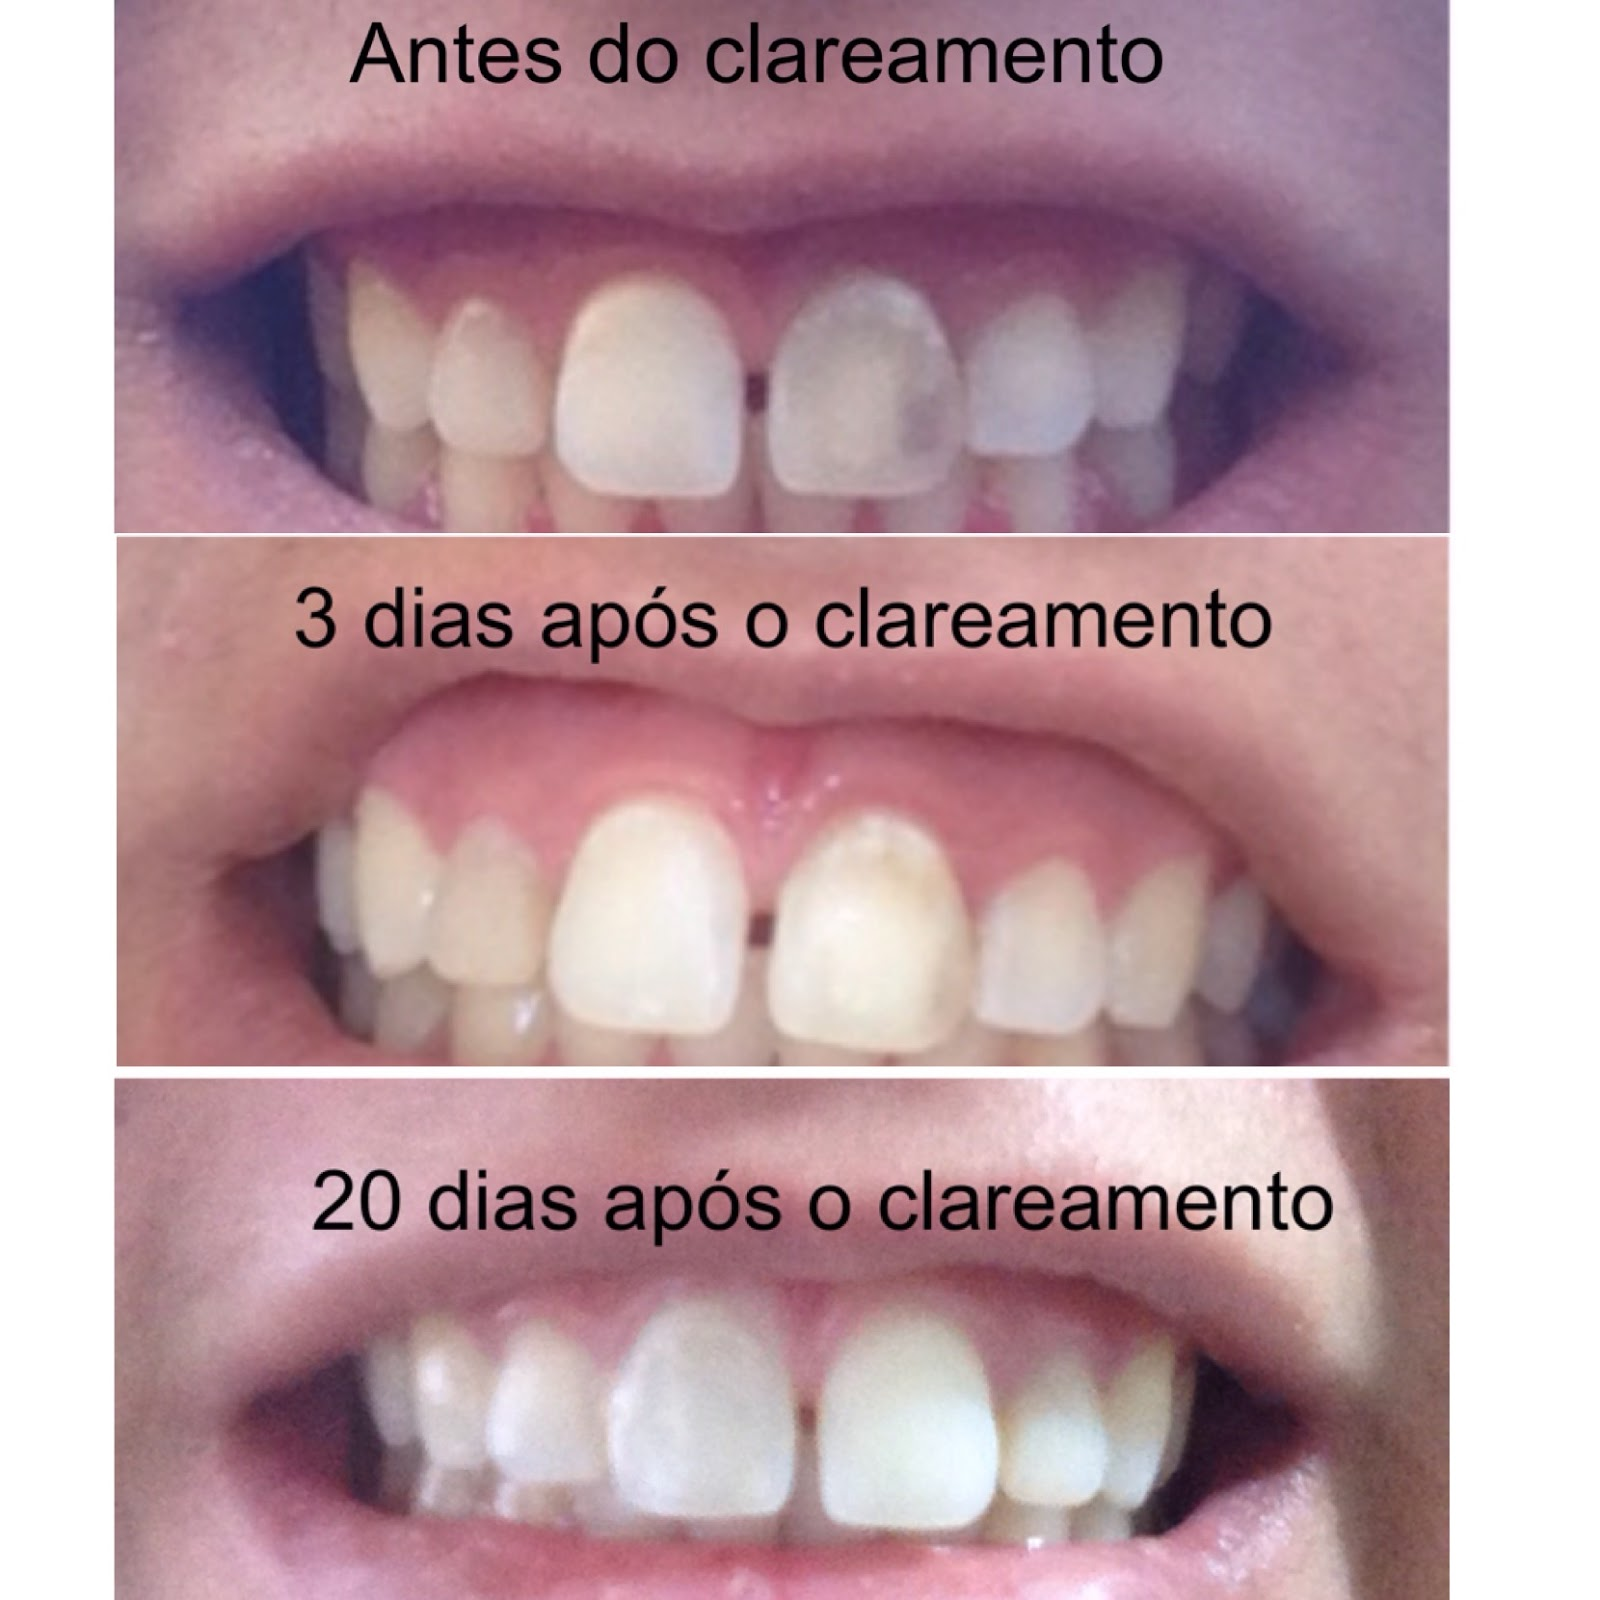 Clareamento Dental Interno Minha Experiencia D Campos